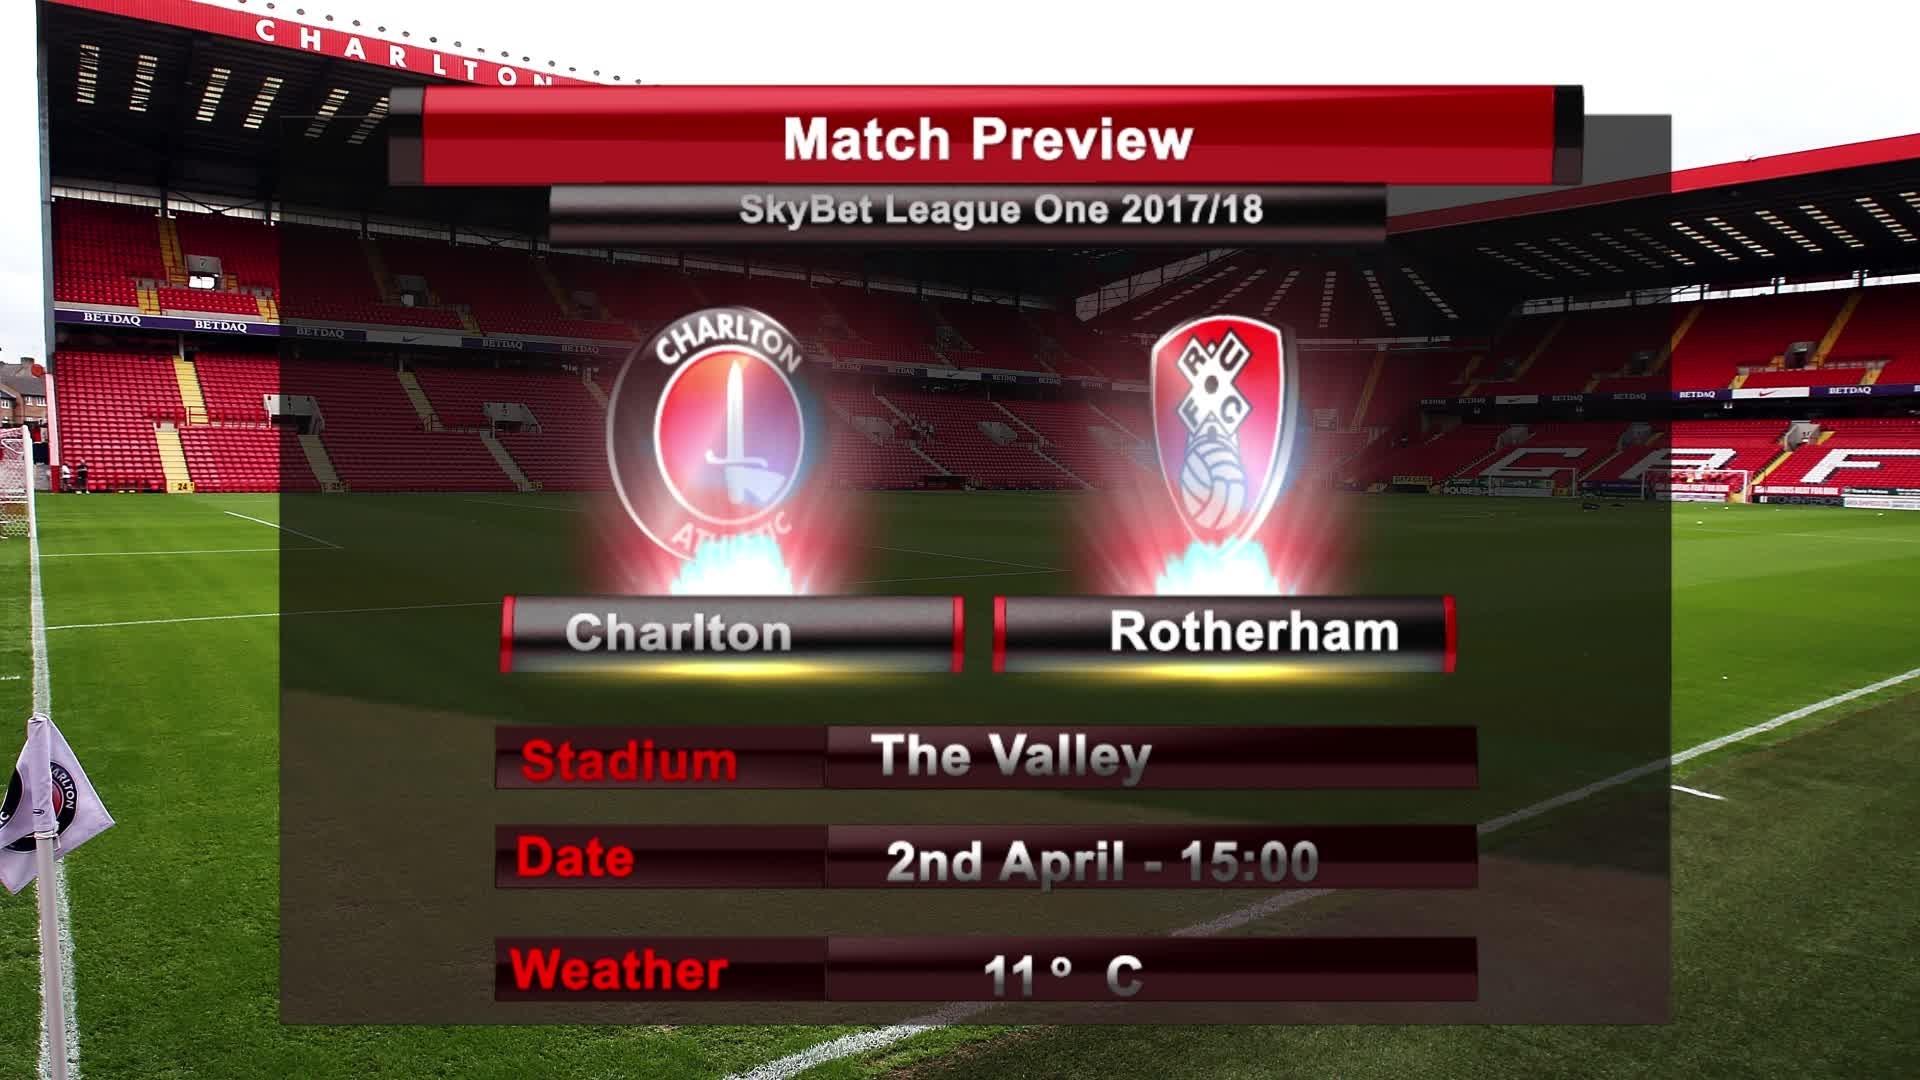 MATCH PREVIEW | Charlton vs Rotherham